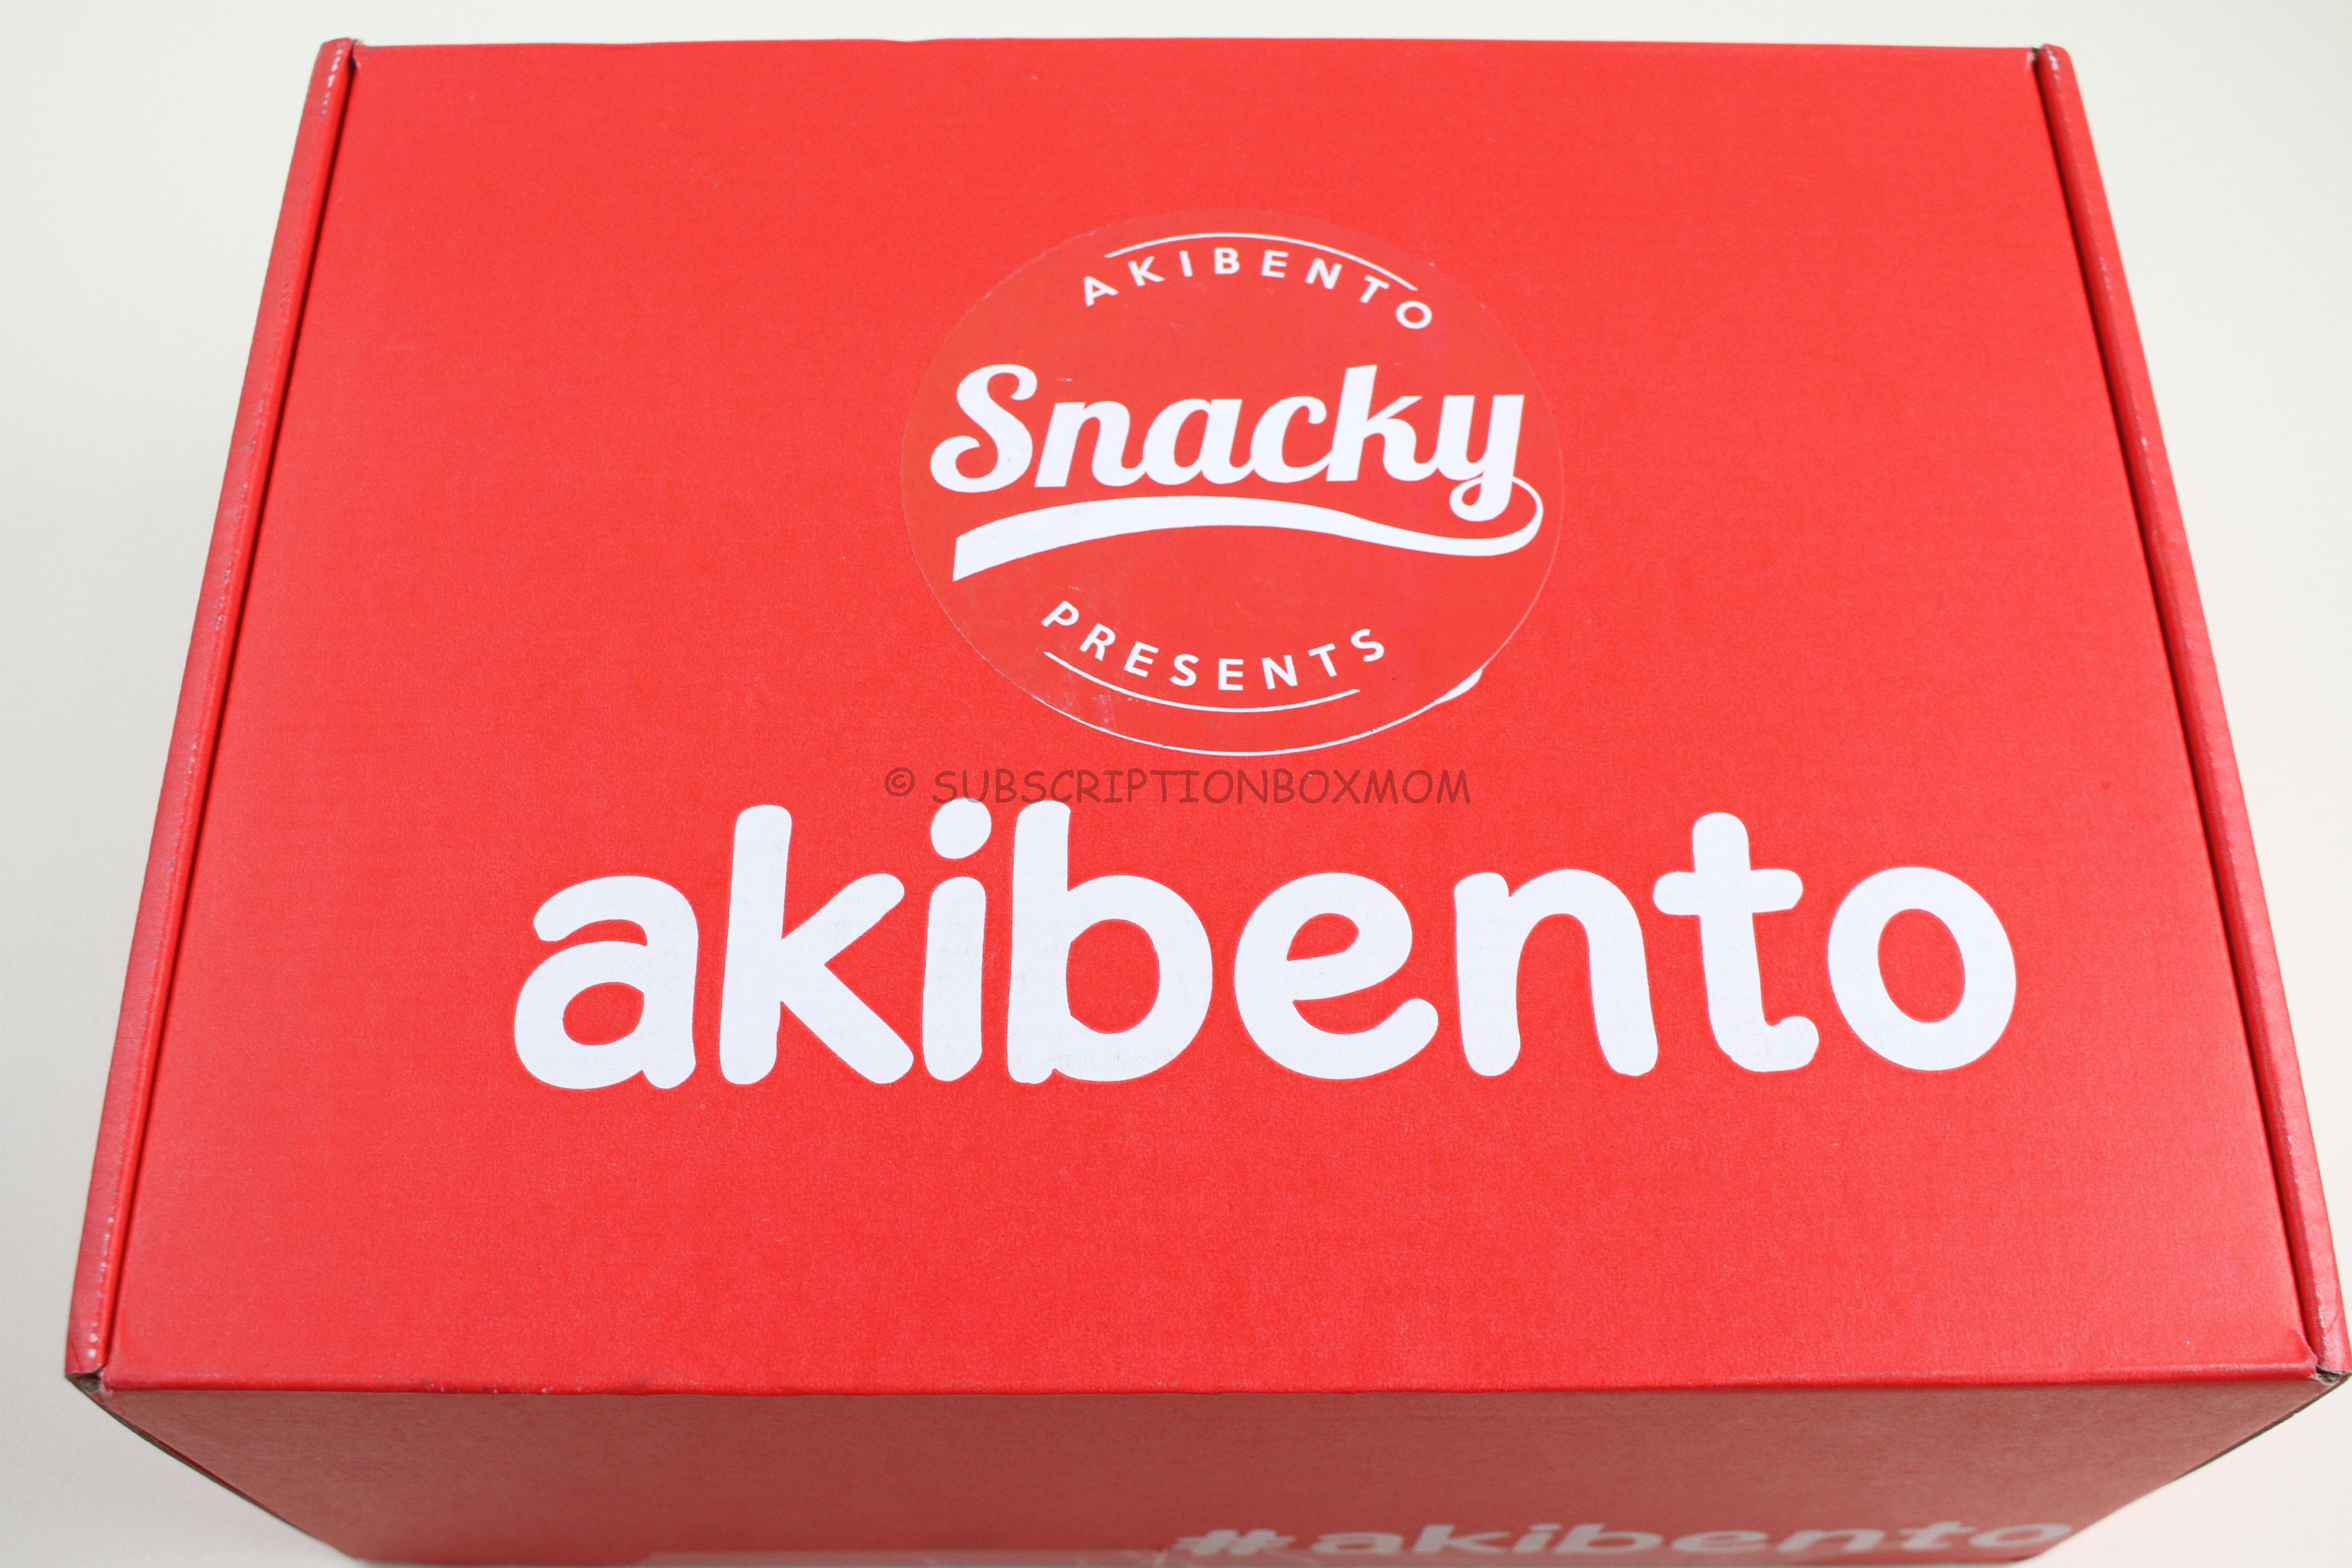 Snacky By Akibento April 2018 Review + Coupon